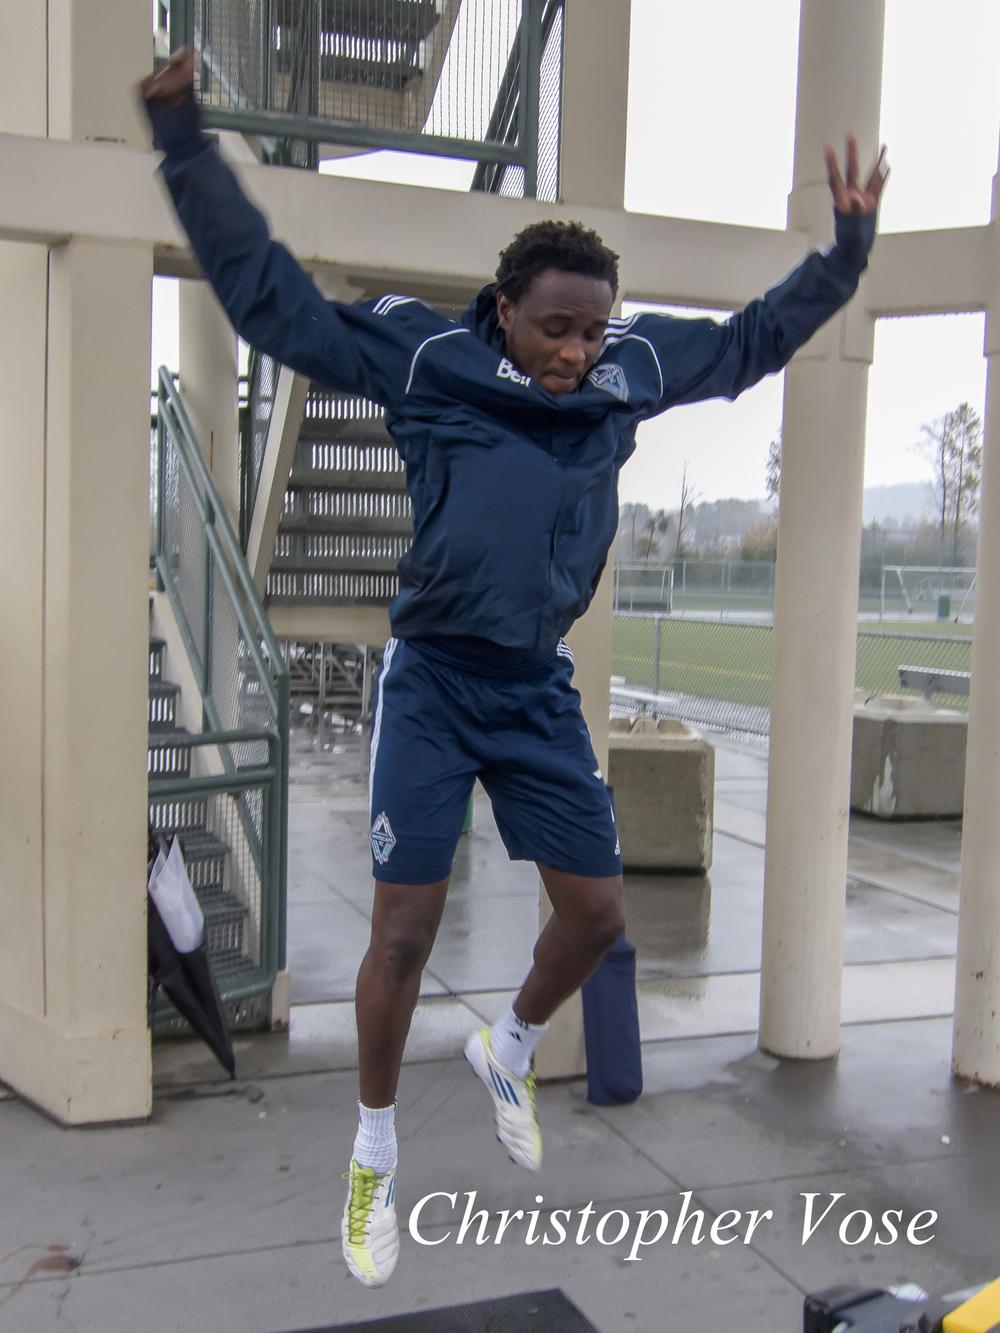 2011-11-07 Mustapha Jraju Vertical Jump Test.jpg